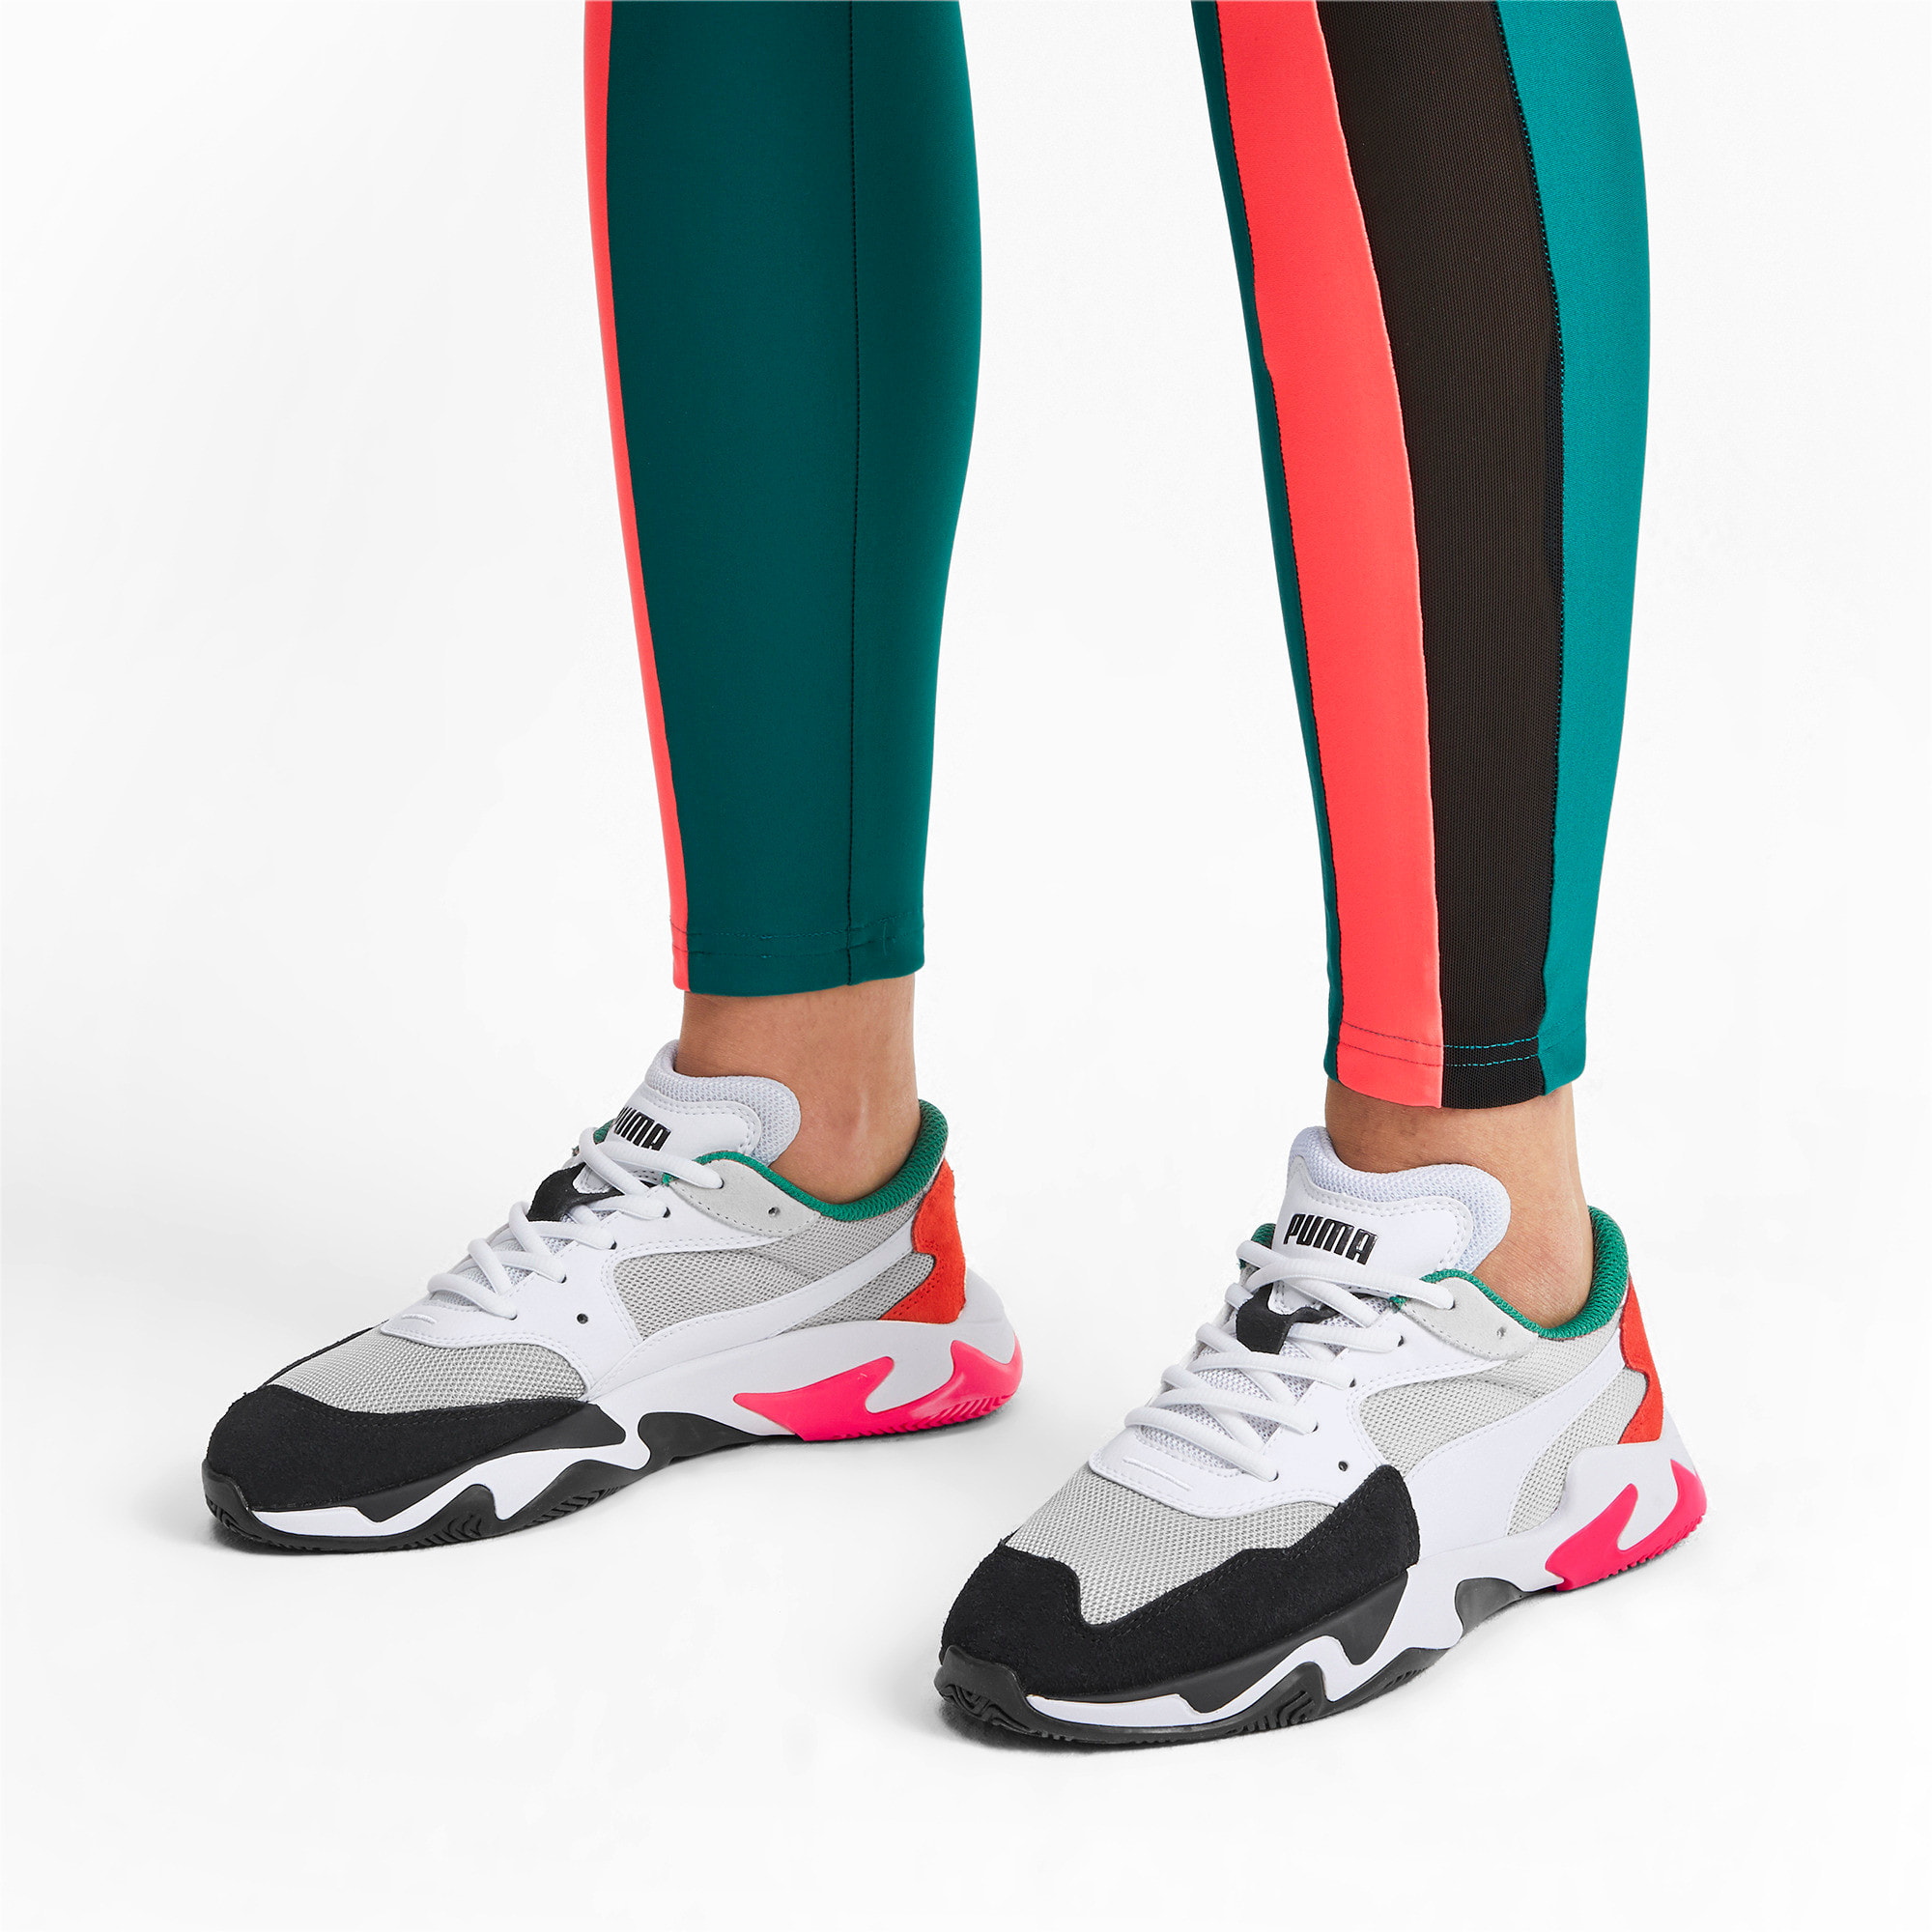 Thumbnail 2 of Storm Adrenaline Sneaker, Puma Black-Gray Violet, medium